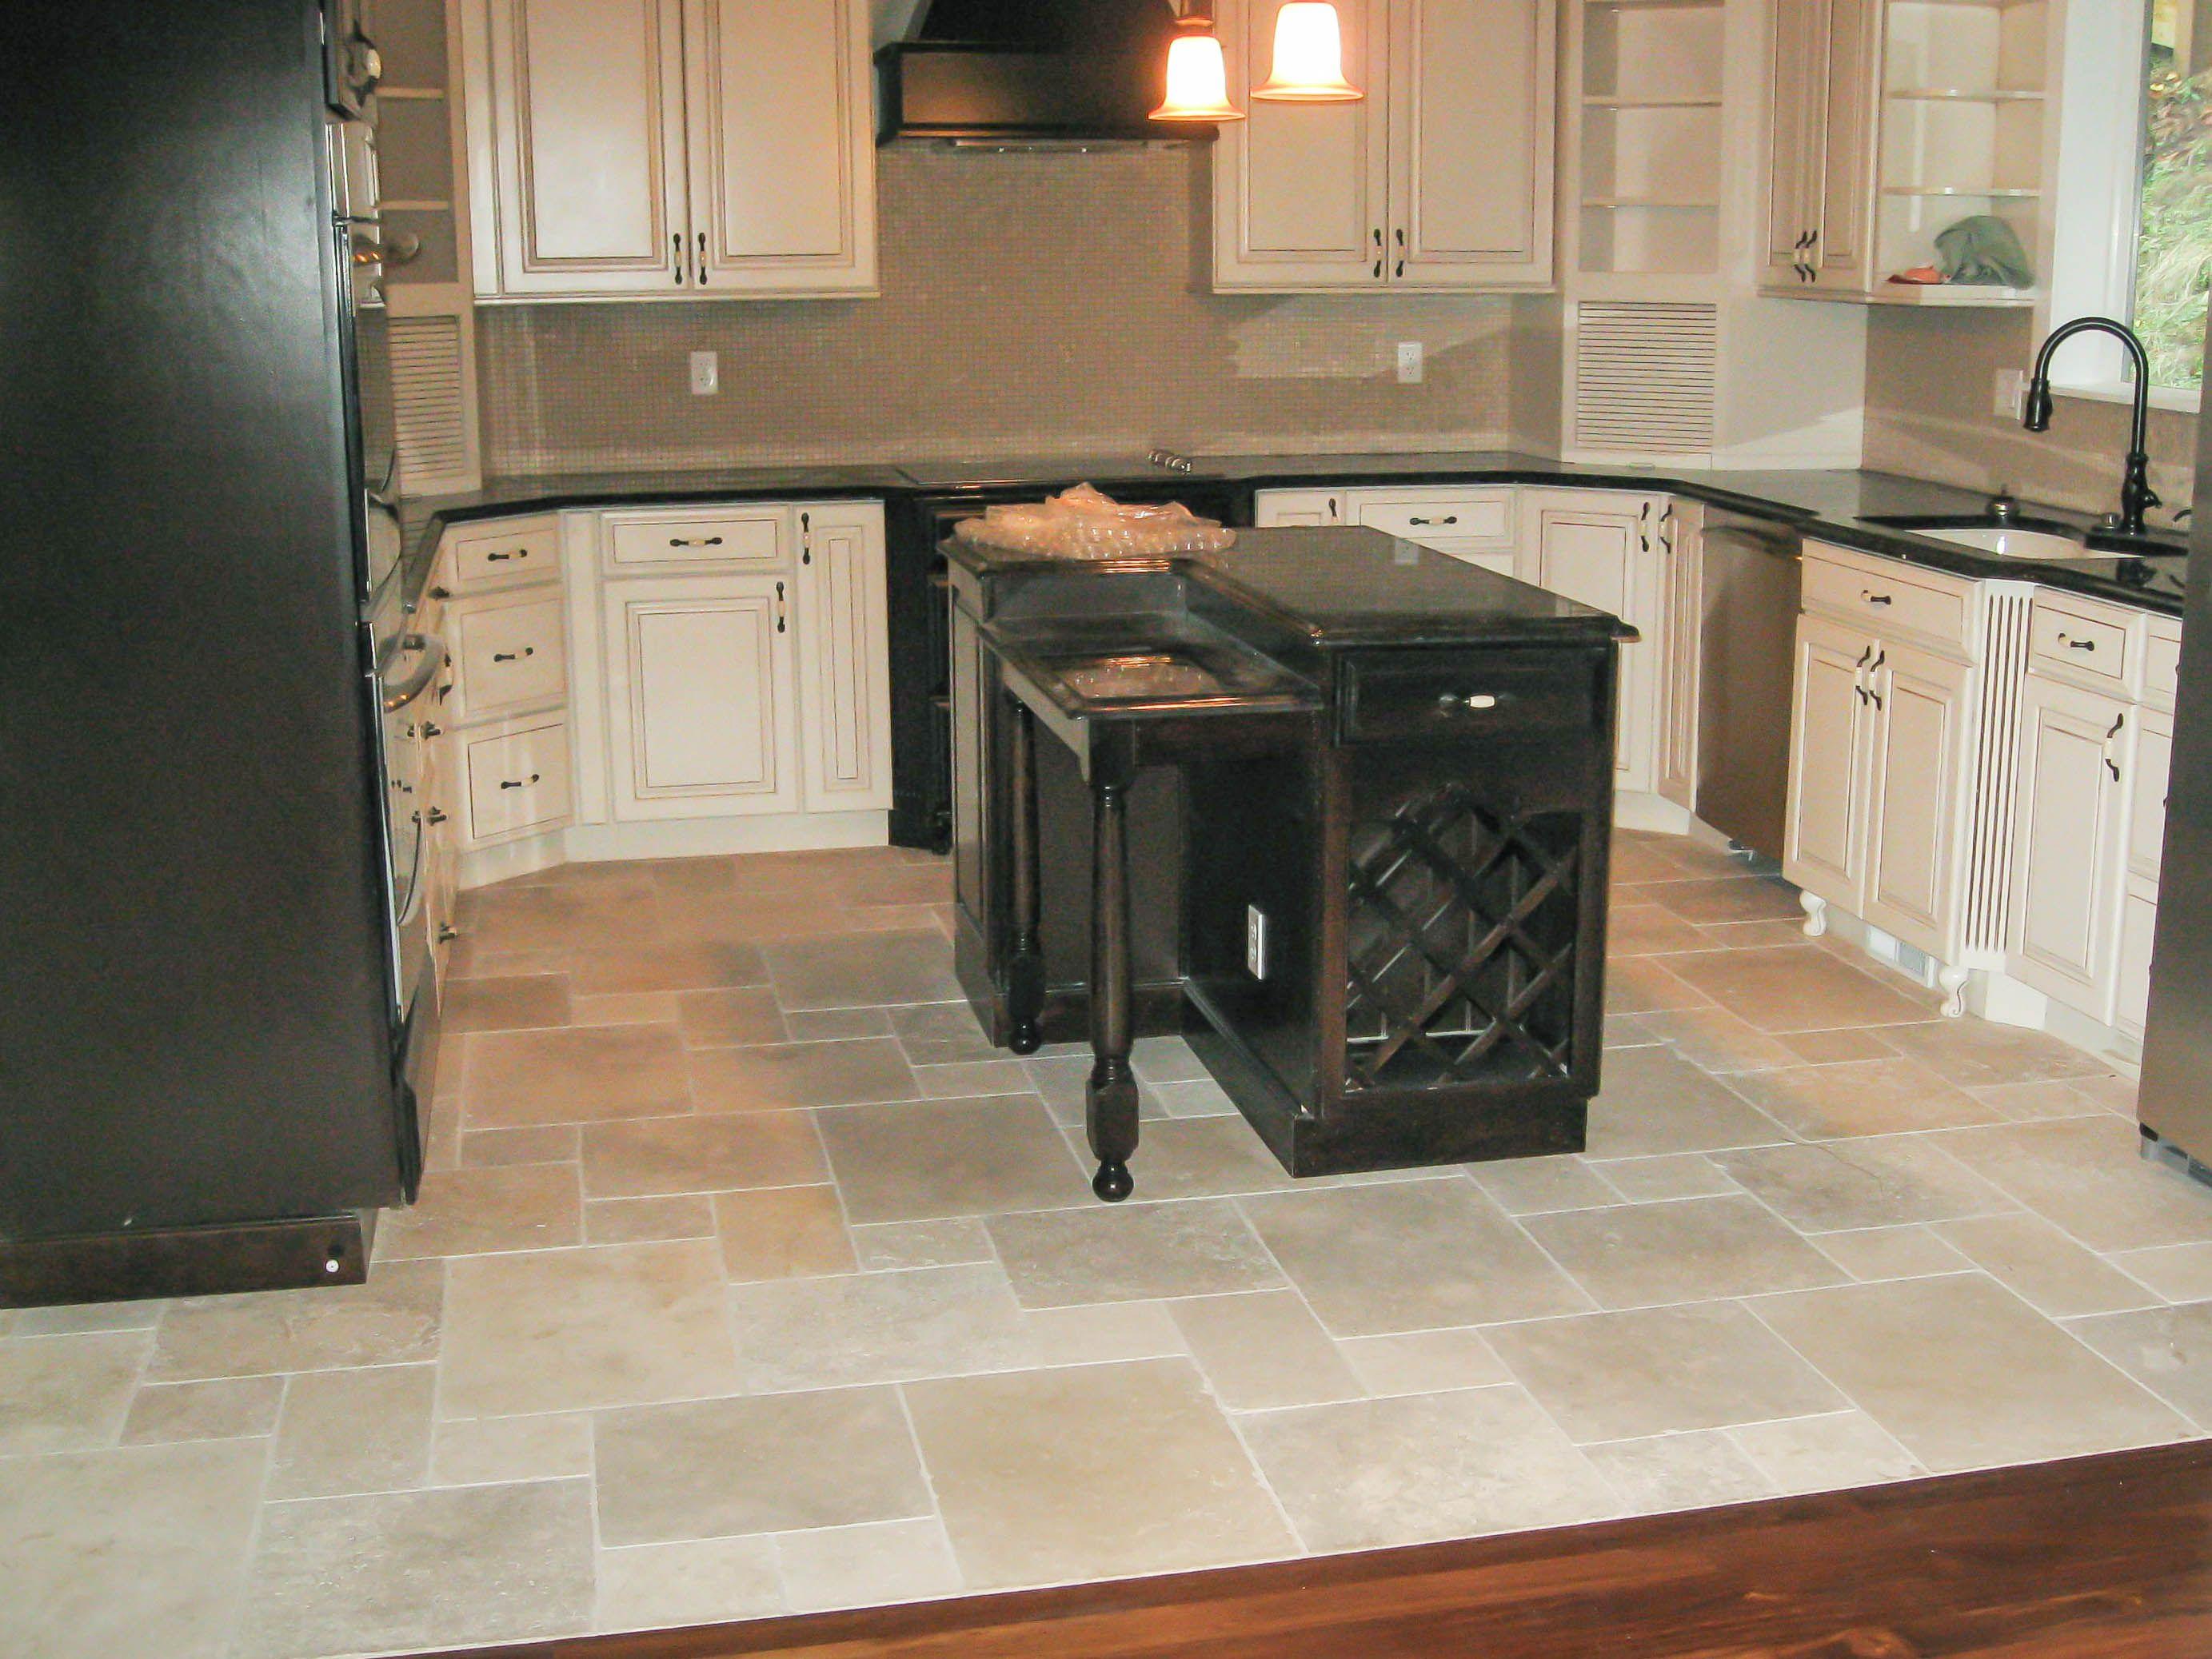 kitchen tile flooring ideas soft cream color kitchen flooring modern kitchen flooring on kitchen flooring ideas id=46850